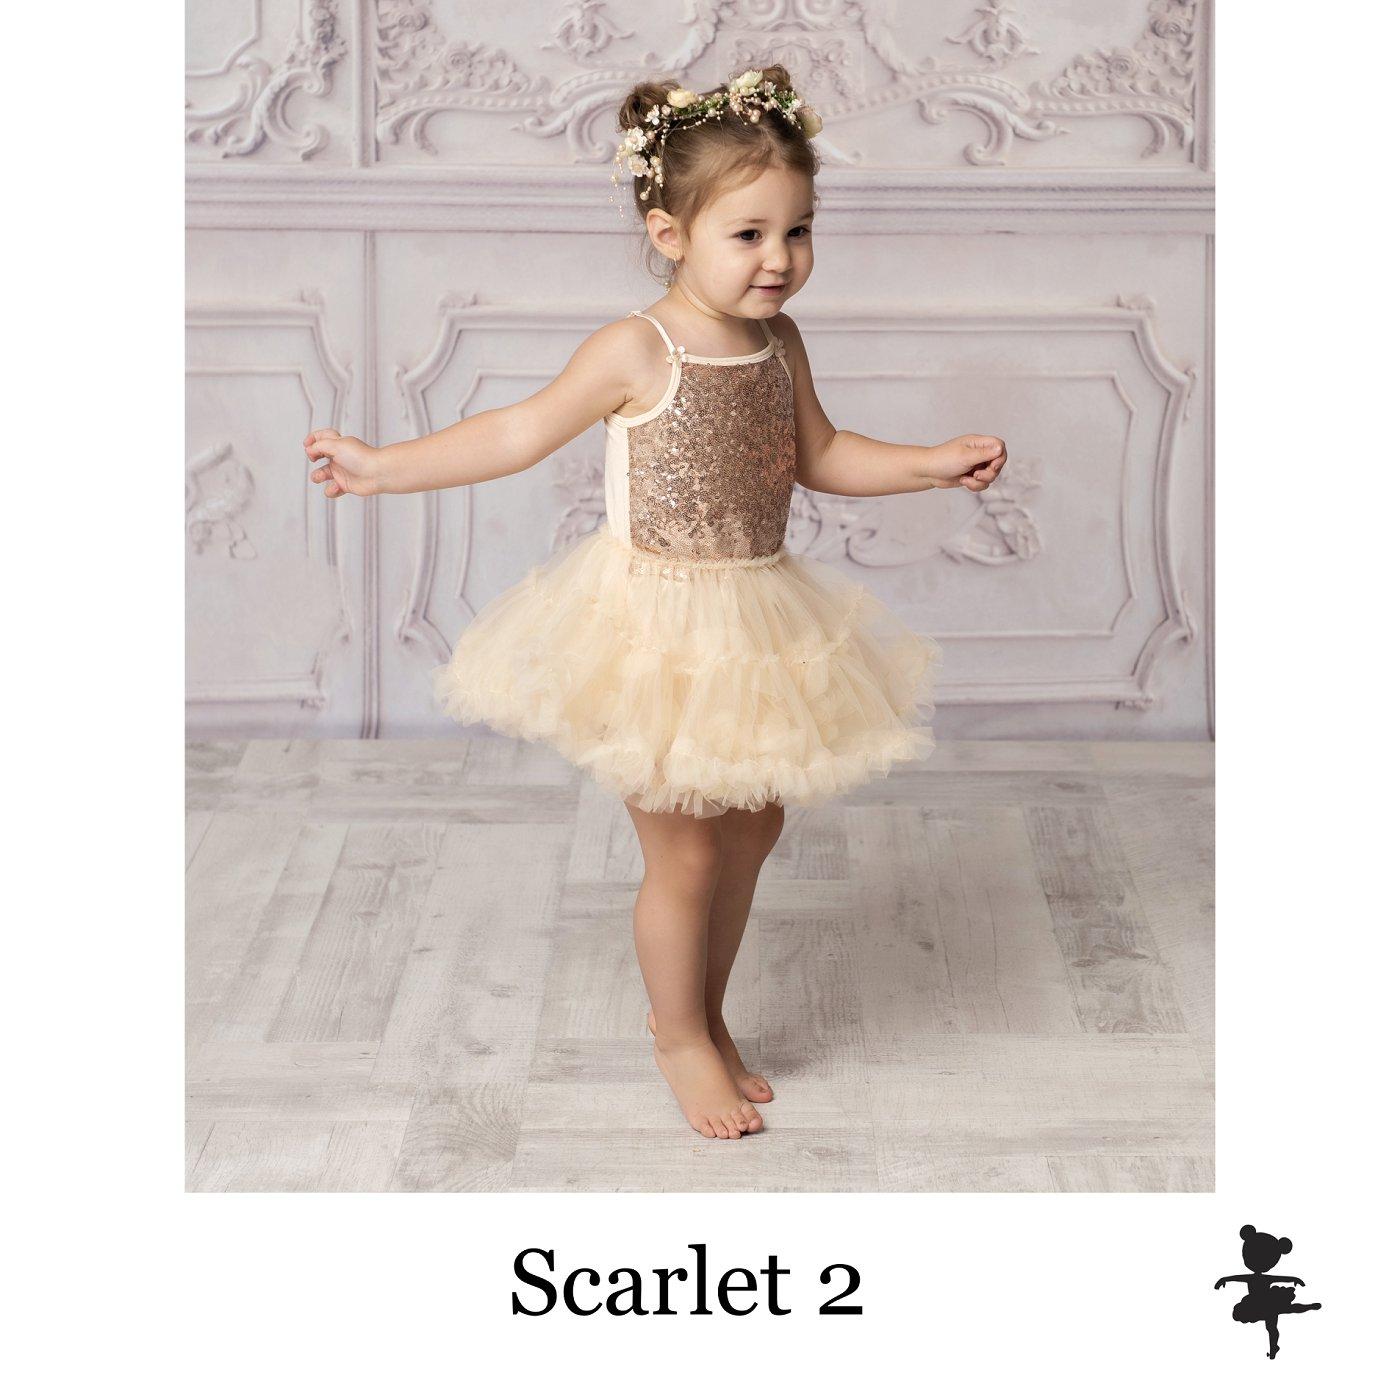 LB9219-Scarlet 2.jpg